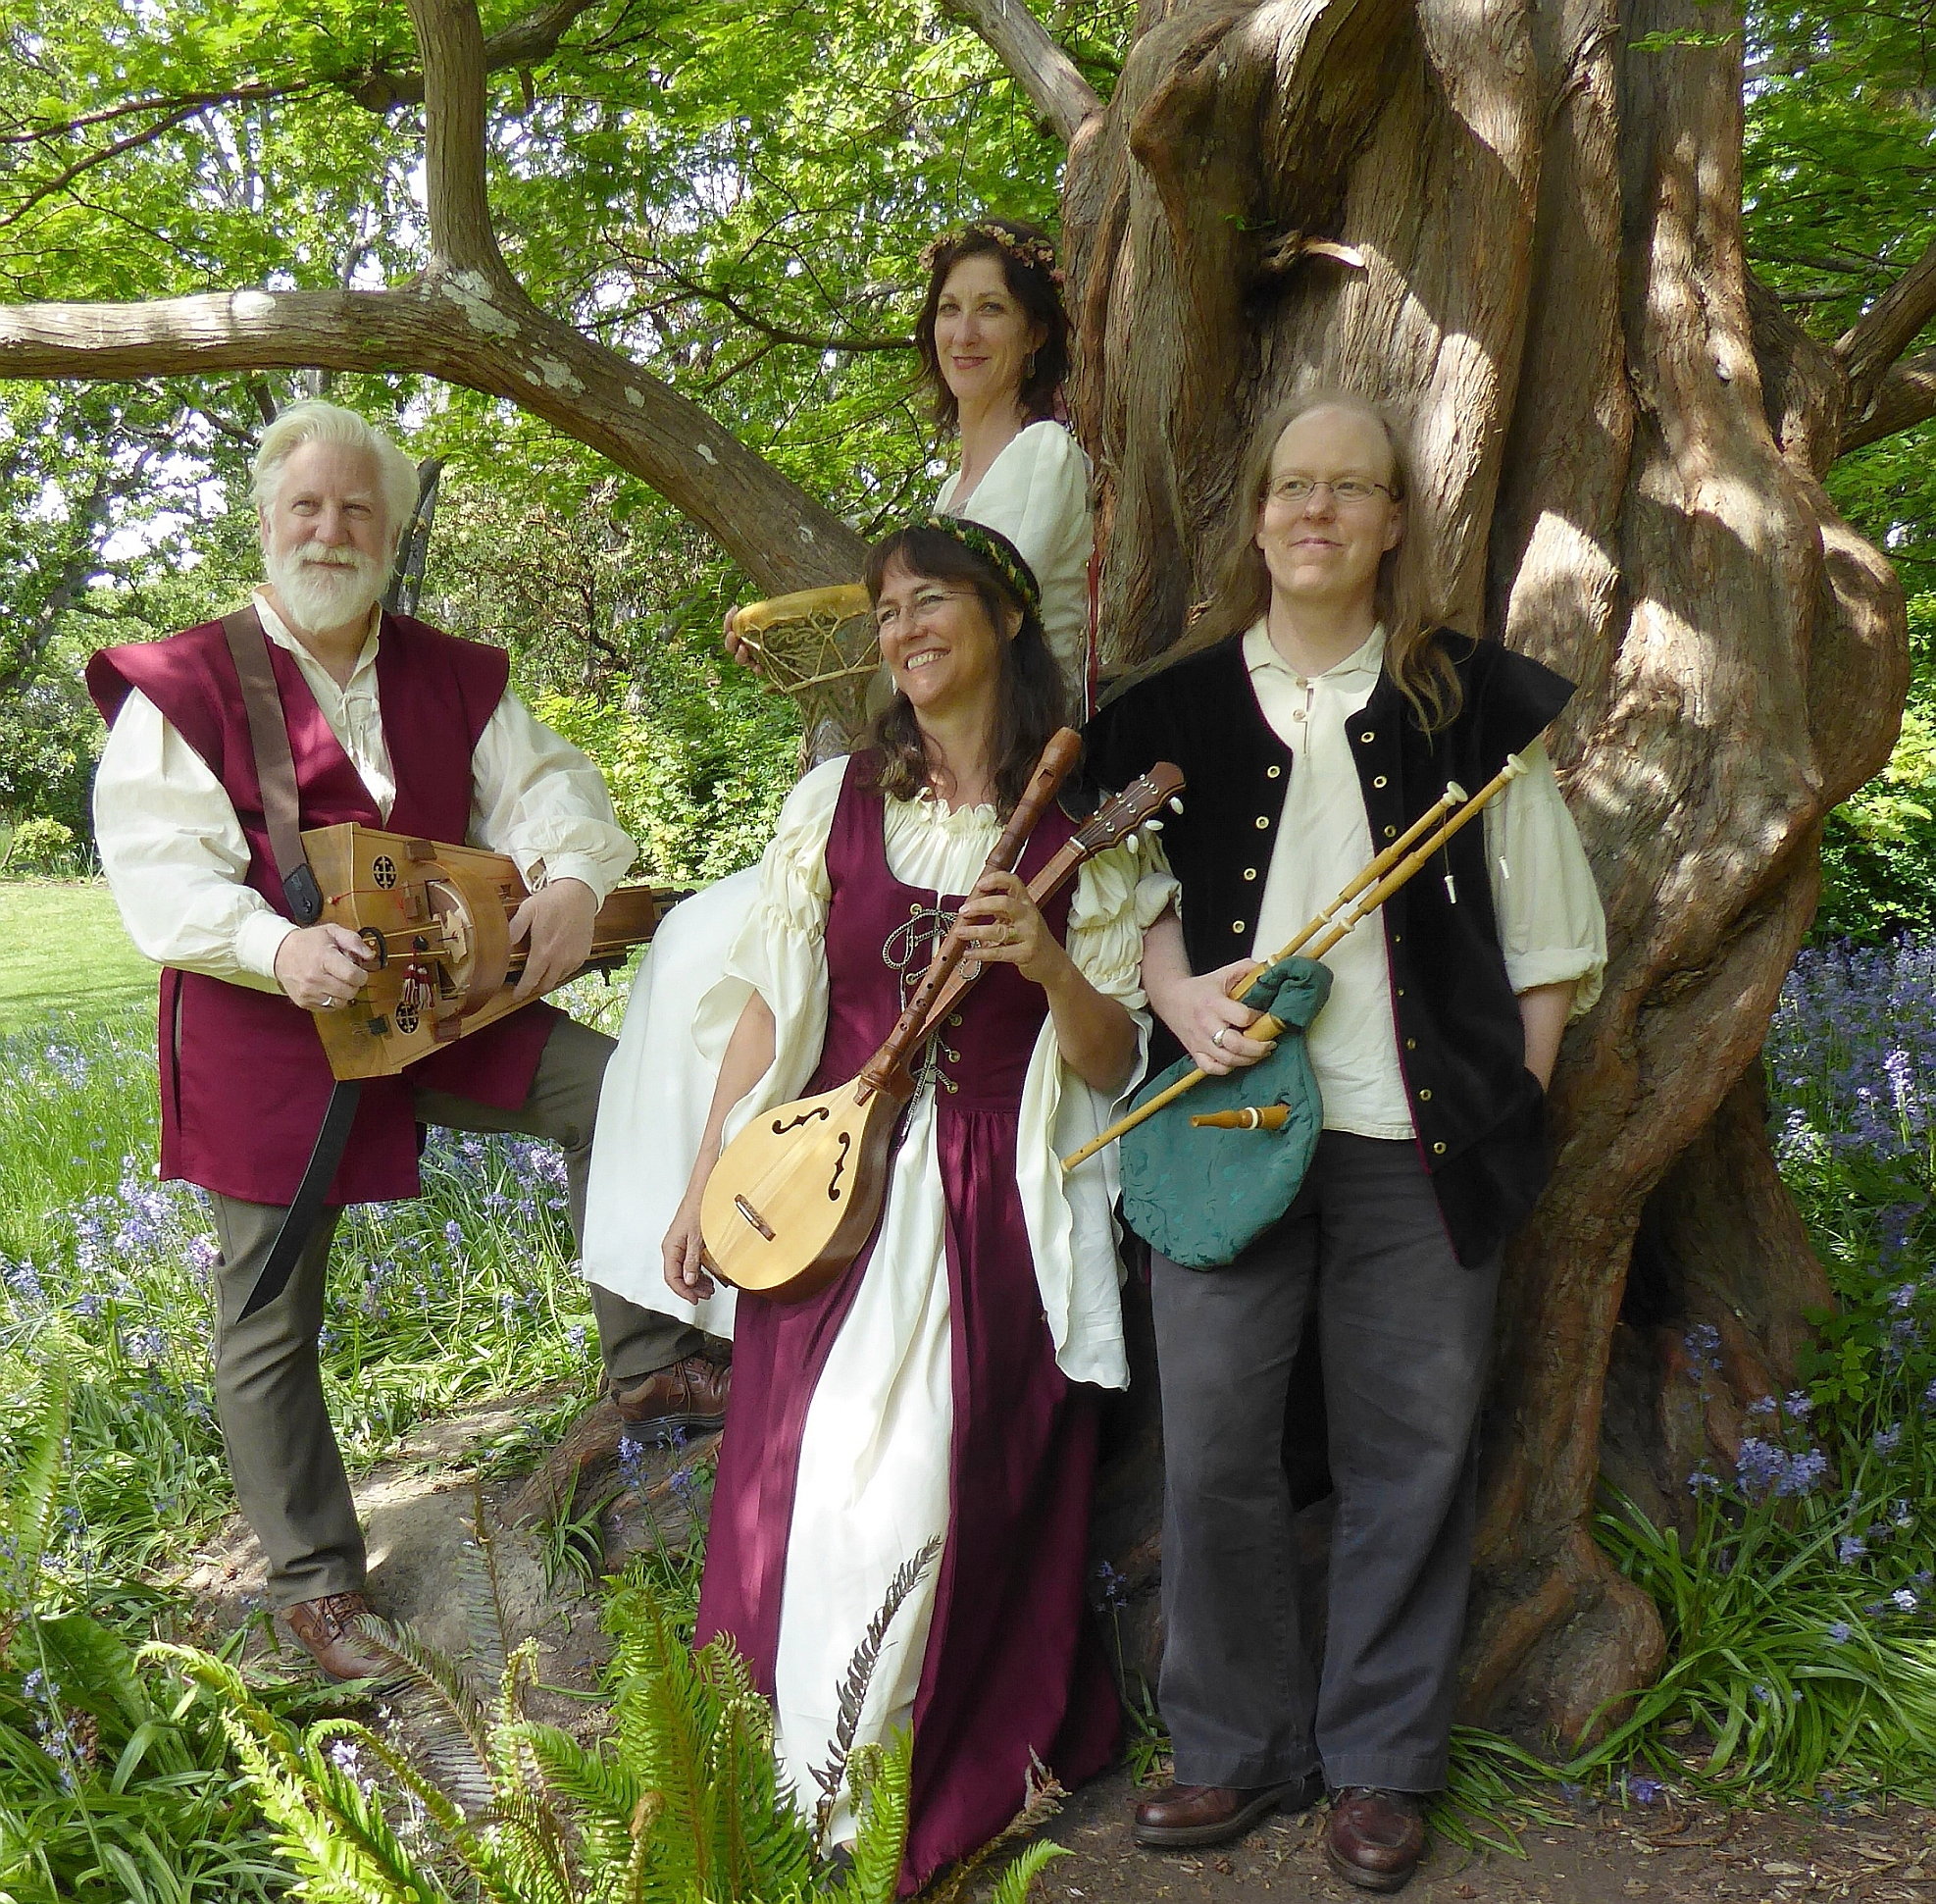 Ancient musicians?